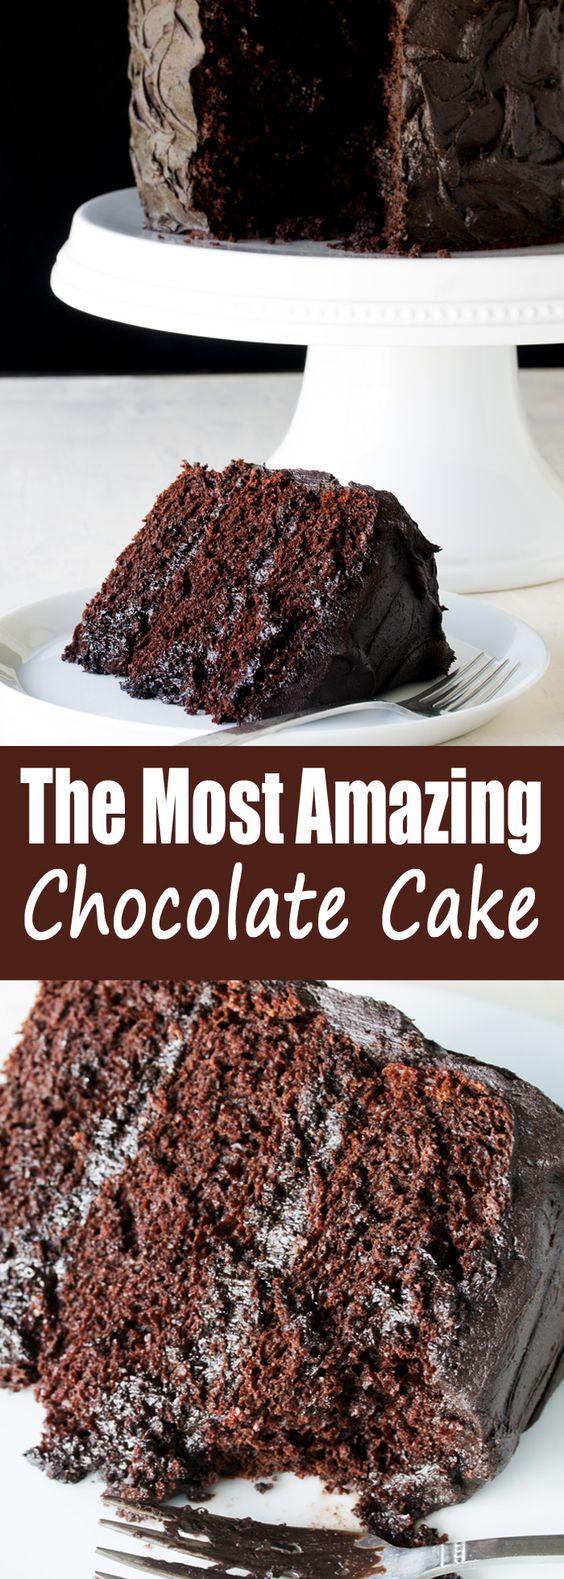 The Most Amazíng Chocolate Cake